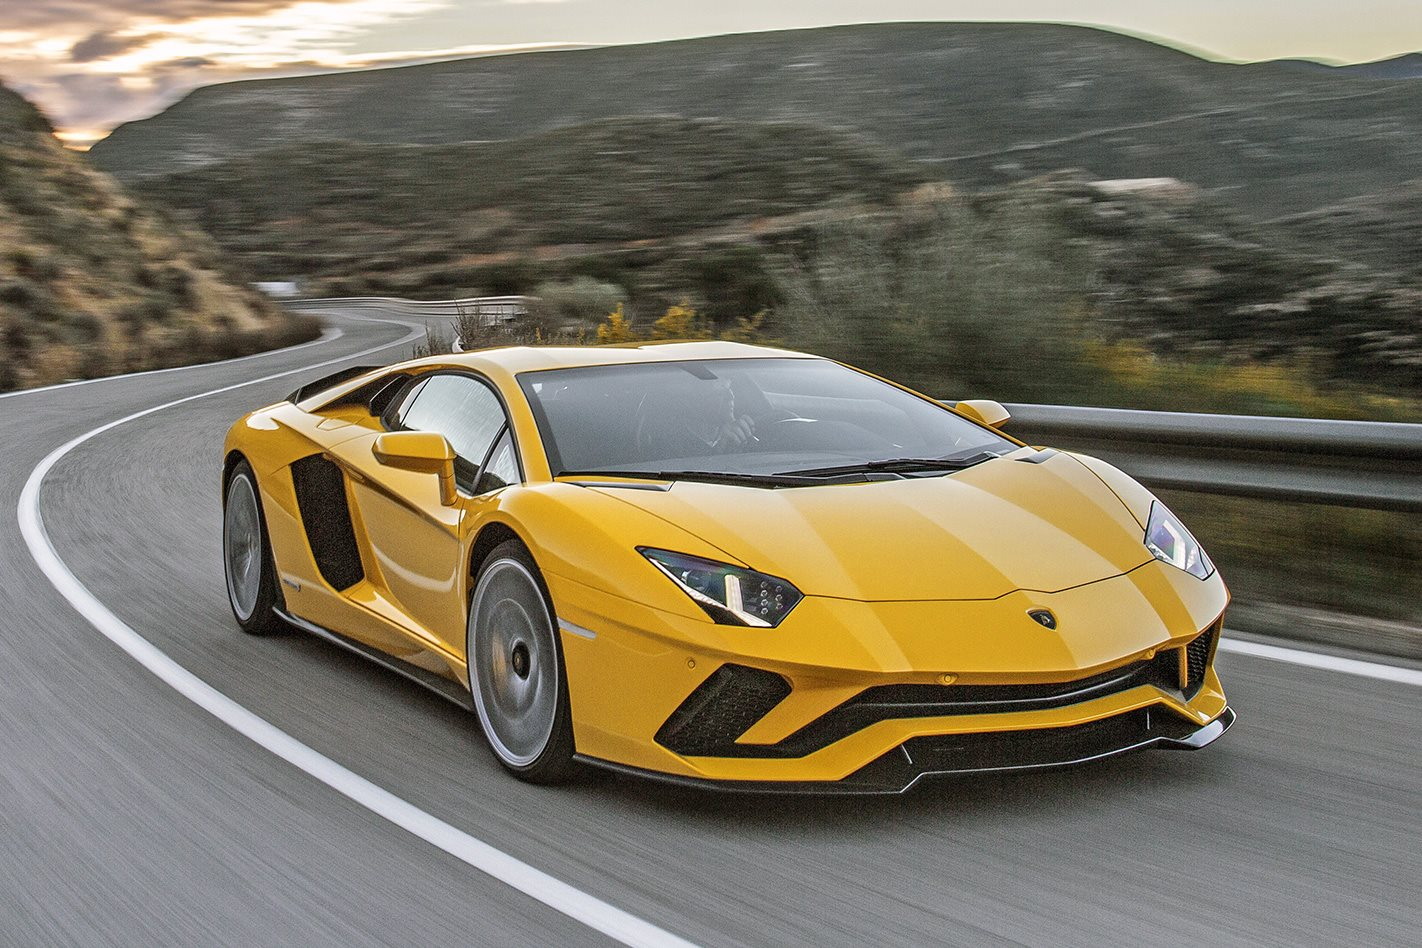 Lamborghini Aventador S driving